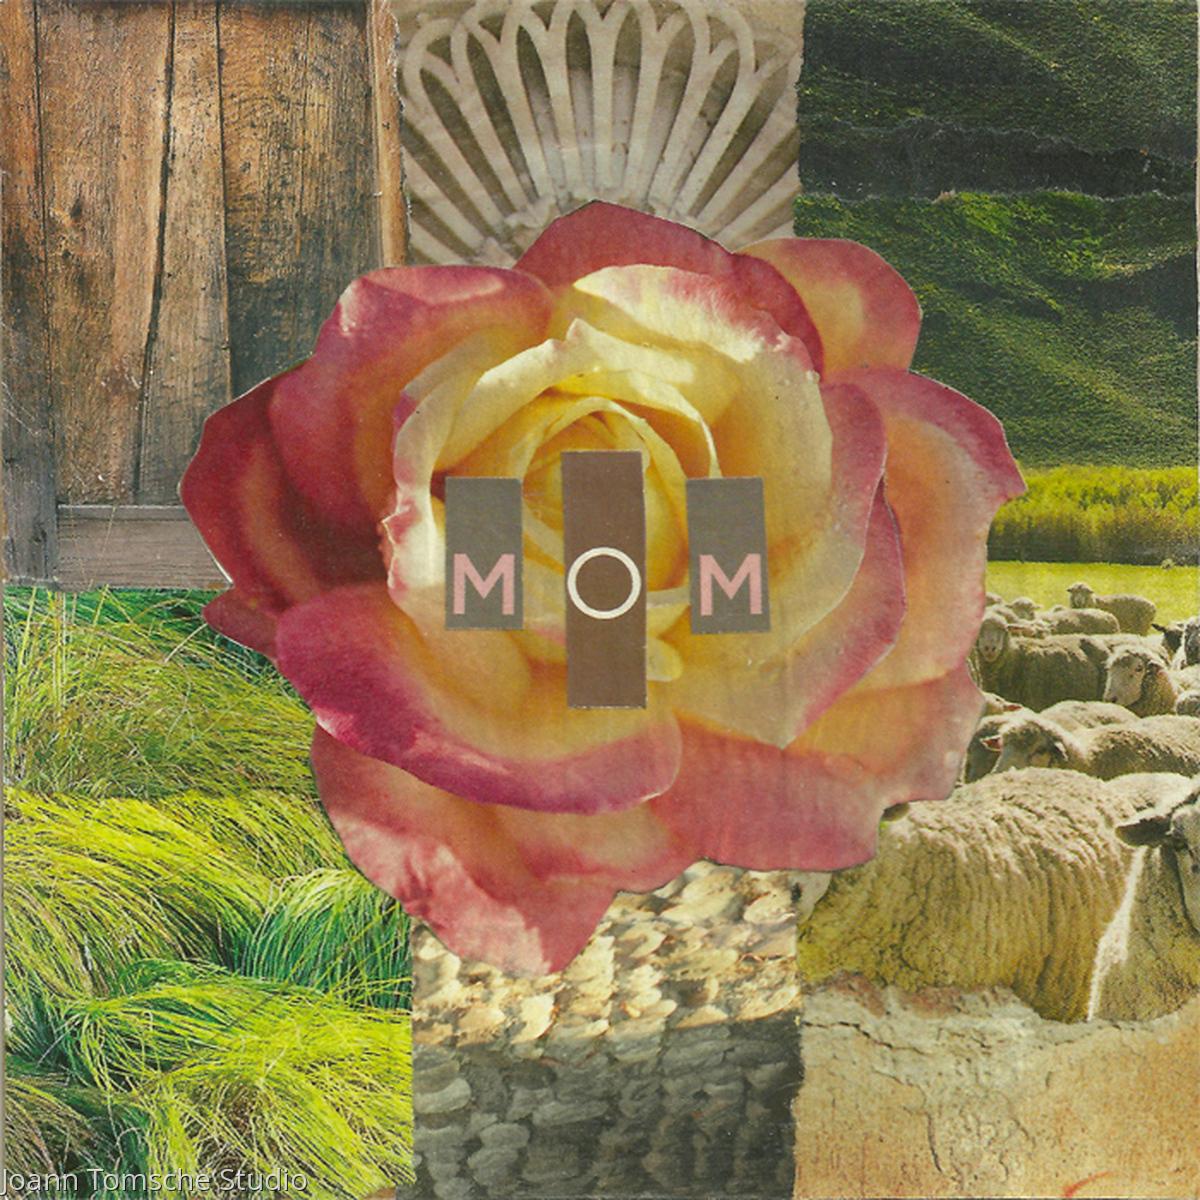 Grassy Rose Mom art tile (large view)